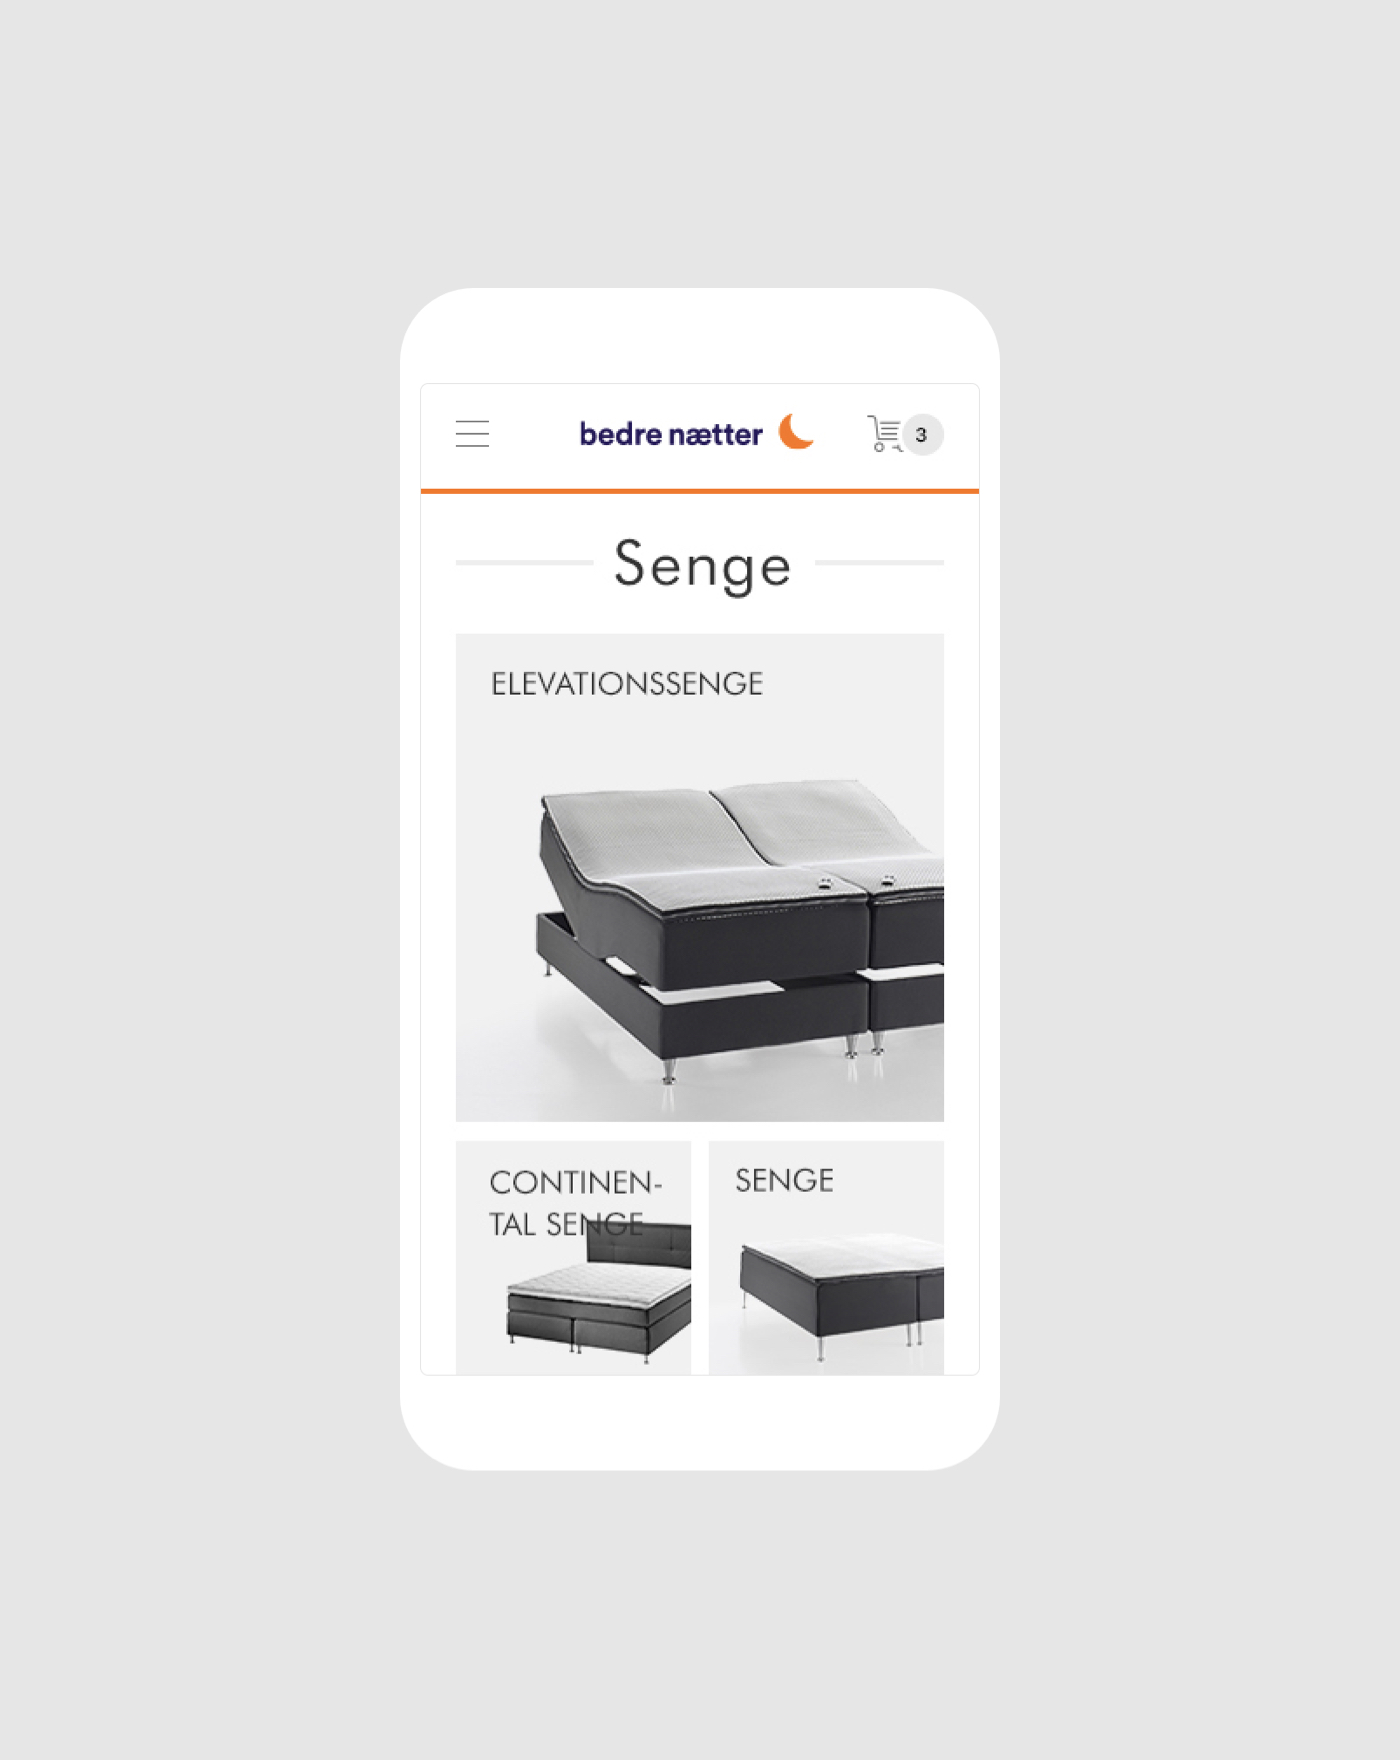 10_02_mobile category page_Bedre Nætter magento website_by_basov_design